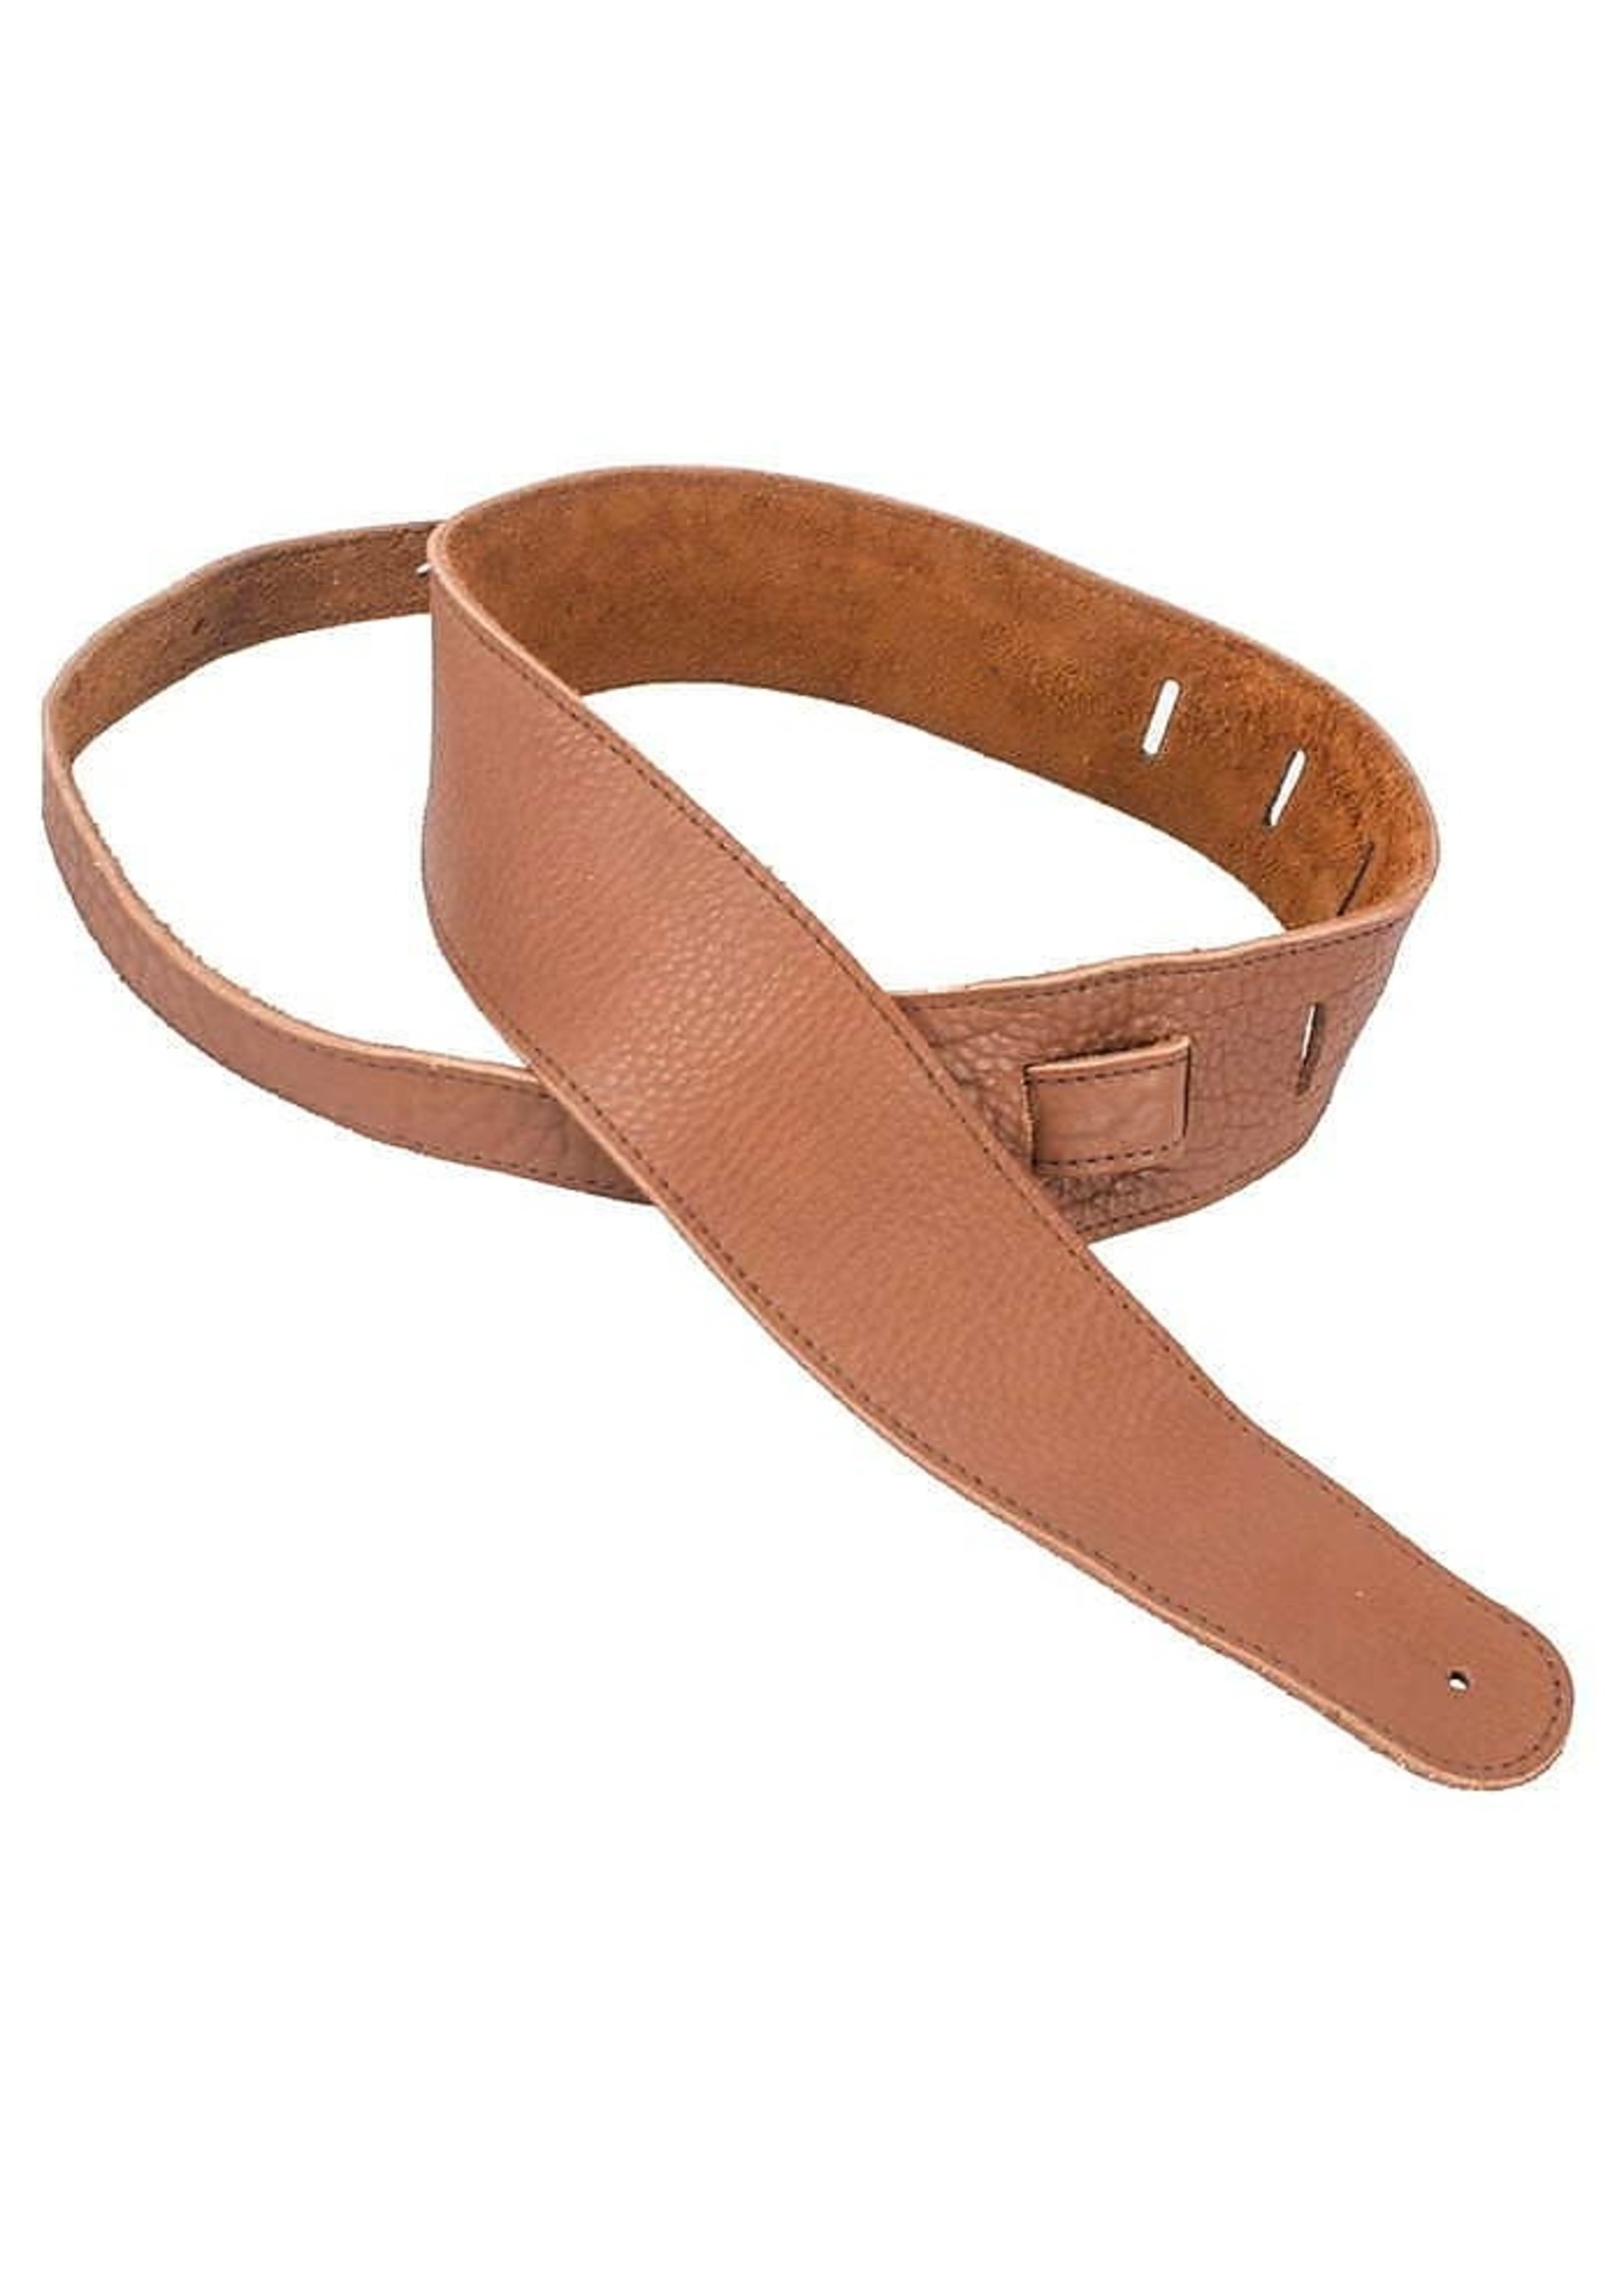 "Henry Heller Henry Heller 2.5"" American Buffalo Leather Strap in Brown"